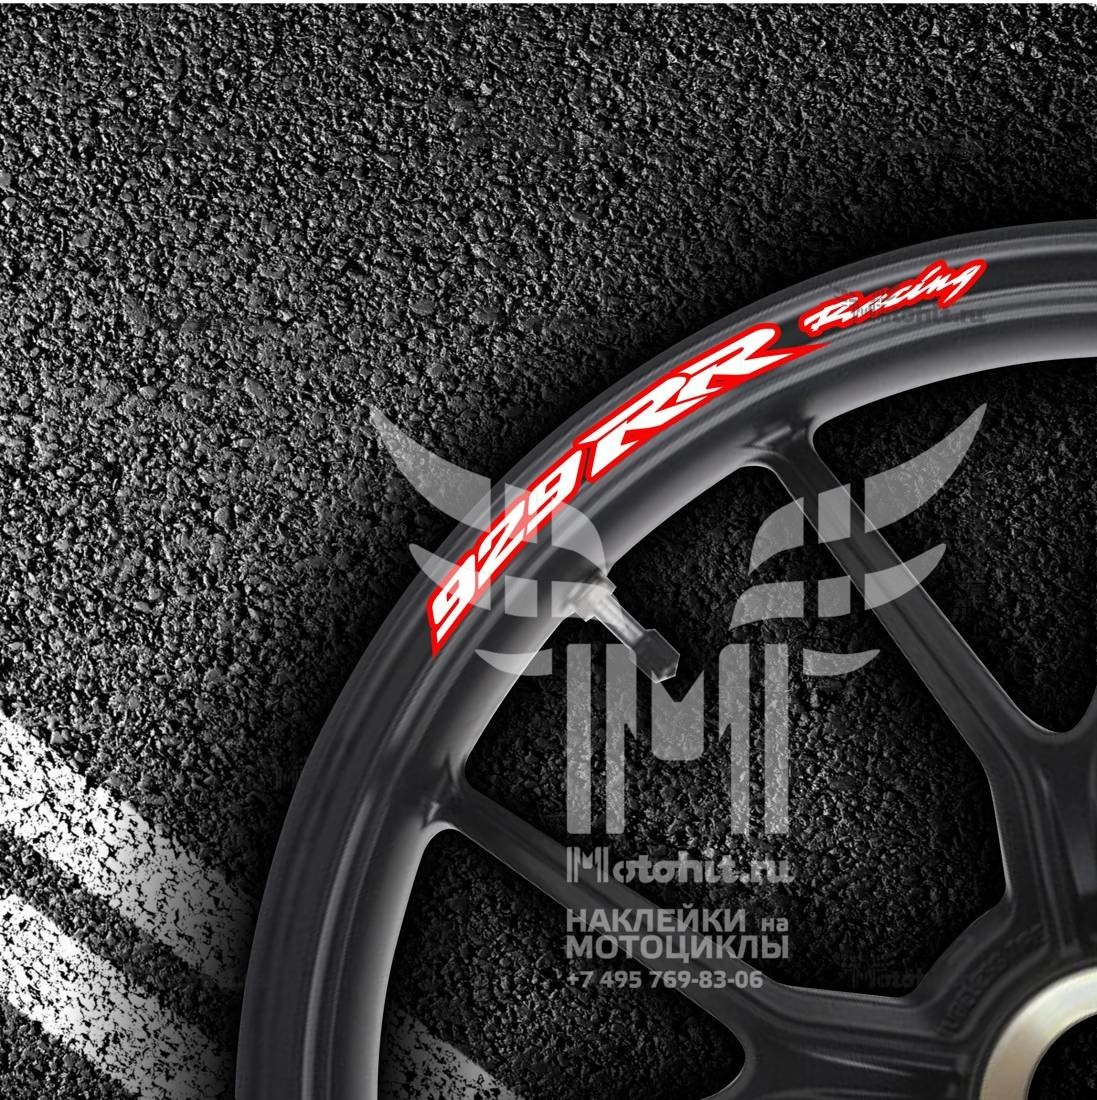 Комплект наклеек на обод колеса мотоцикла HONDA 929-RR-RACING